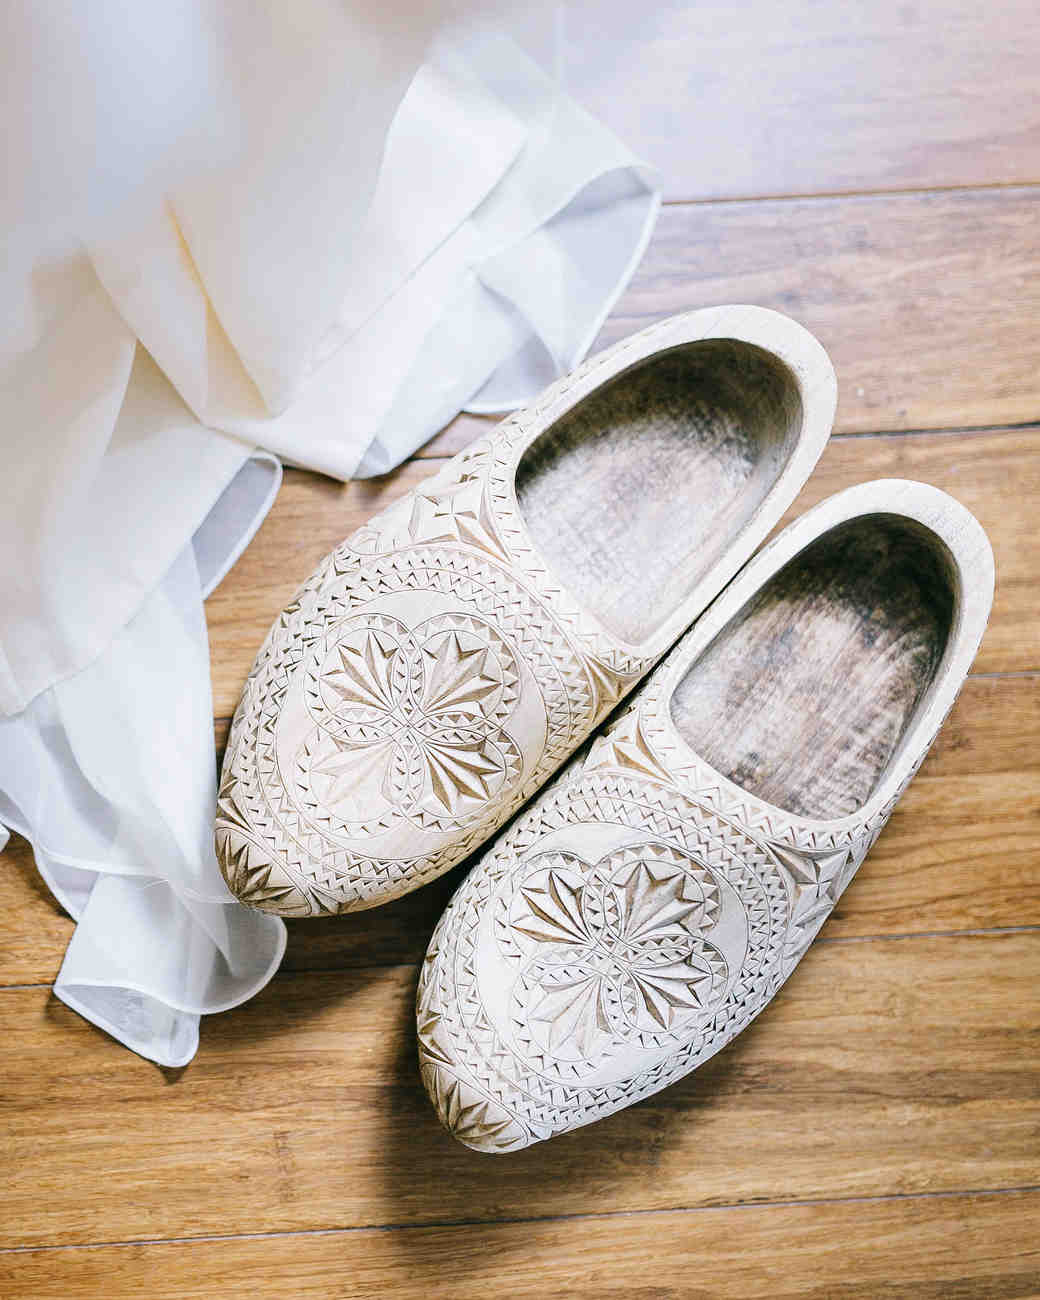 rachel-jurrie-nautical-wedding-woodshoes-0047-s112778-0416.jpg